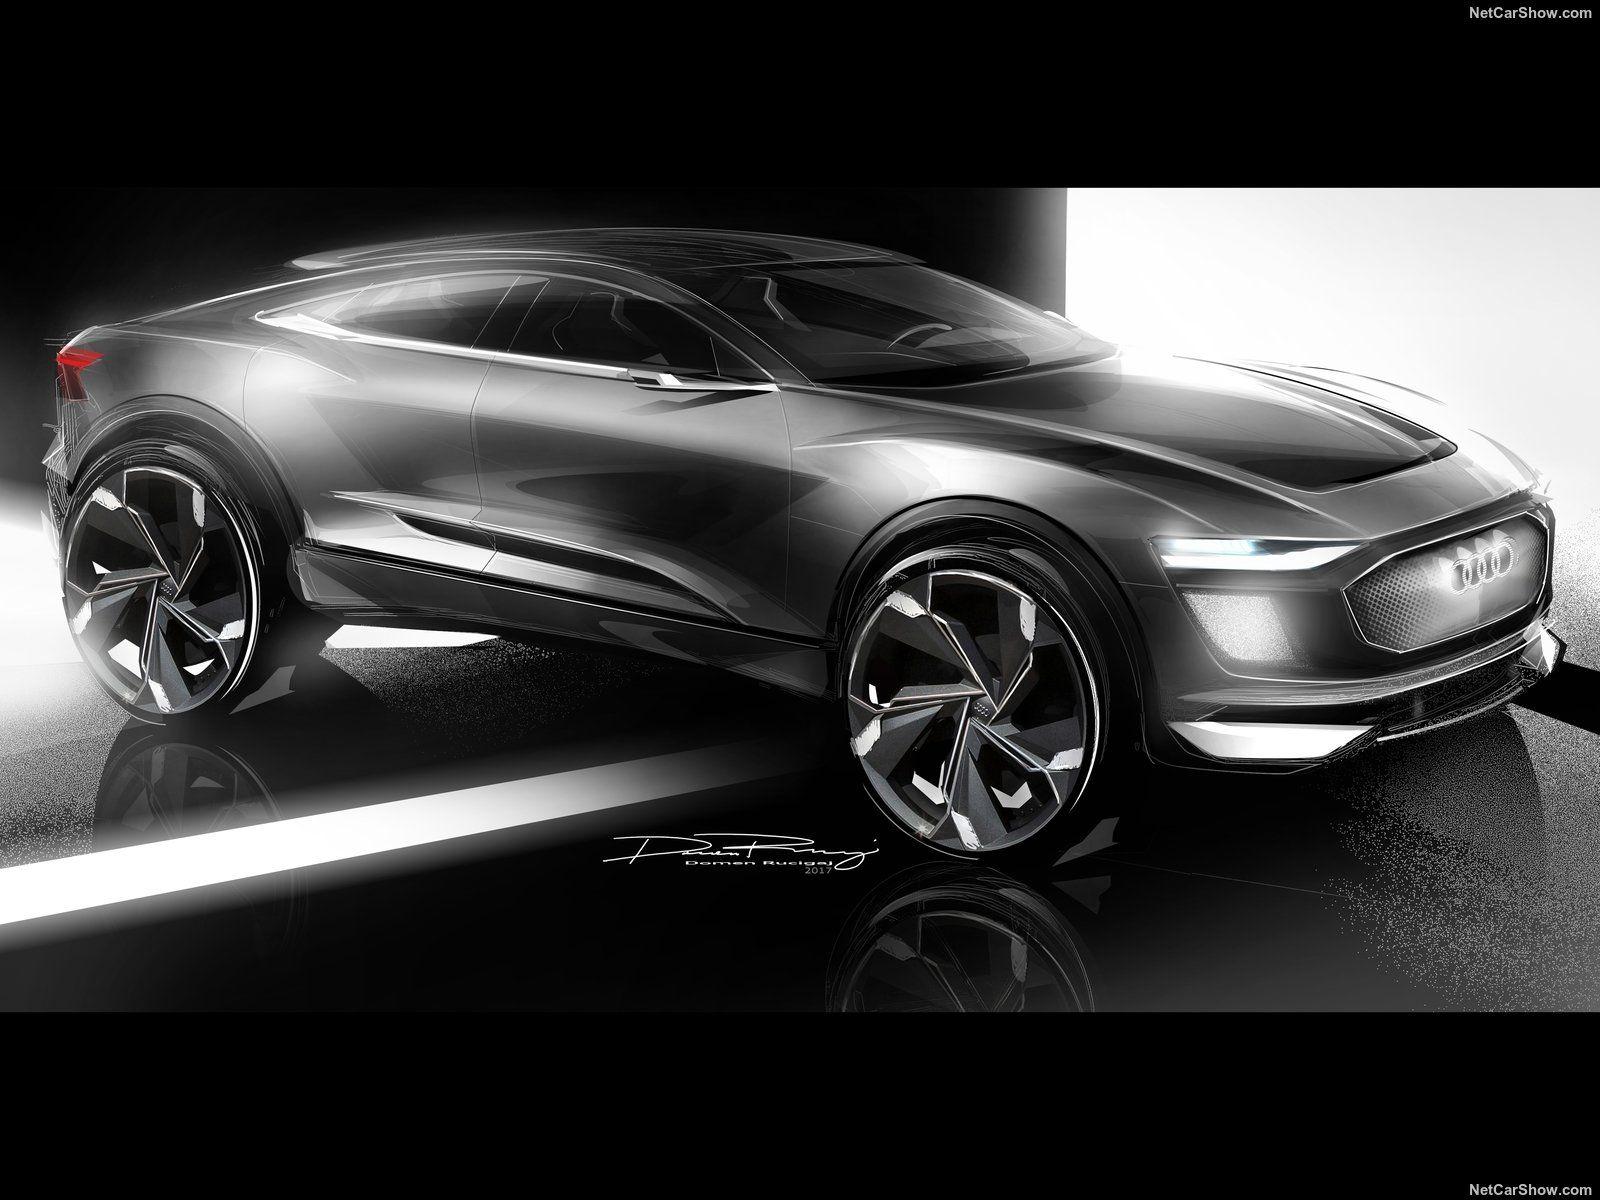 Lexus lf gh concept 2011 exterior detail 49 of 49 1600x1200 - Domen Rucigaj Audi Design